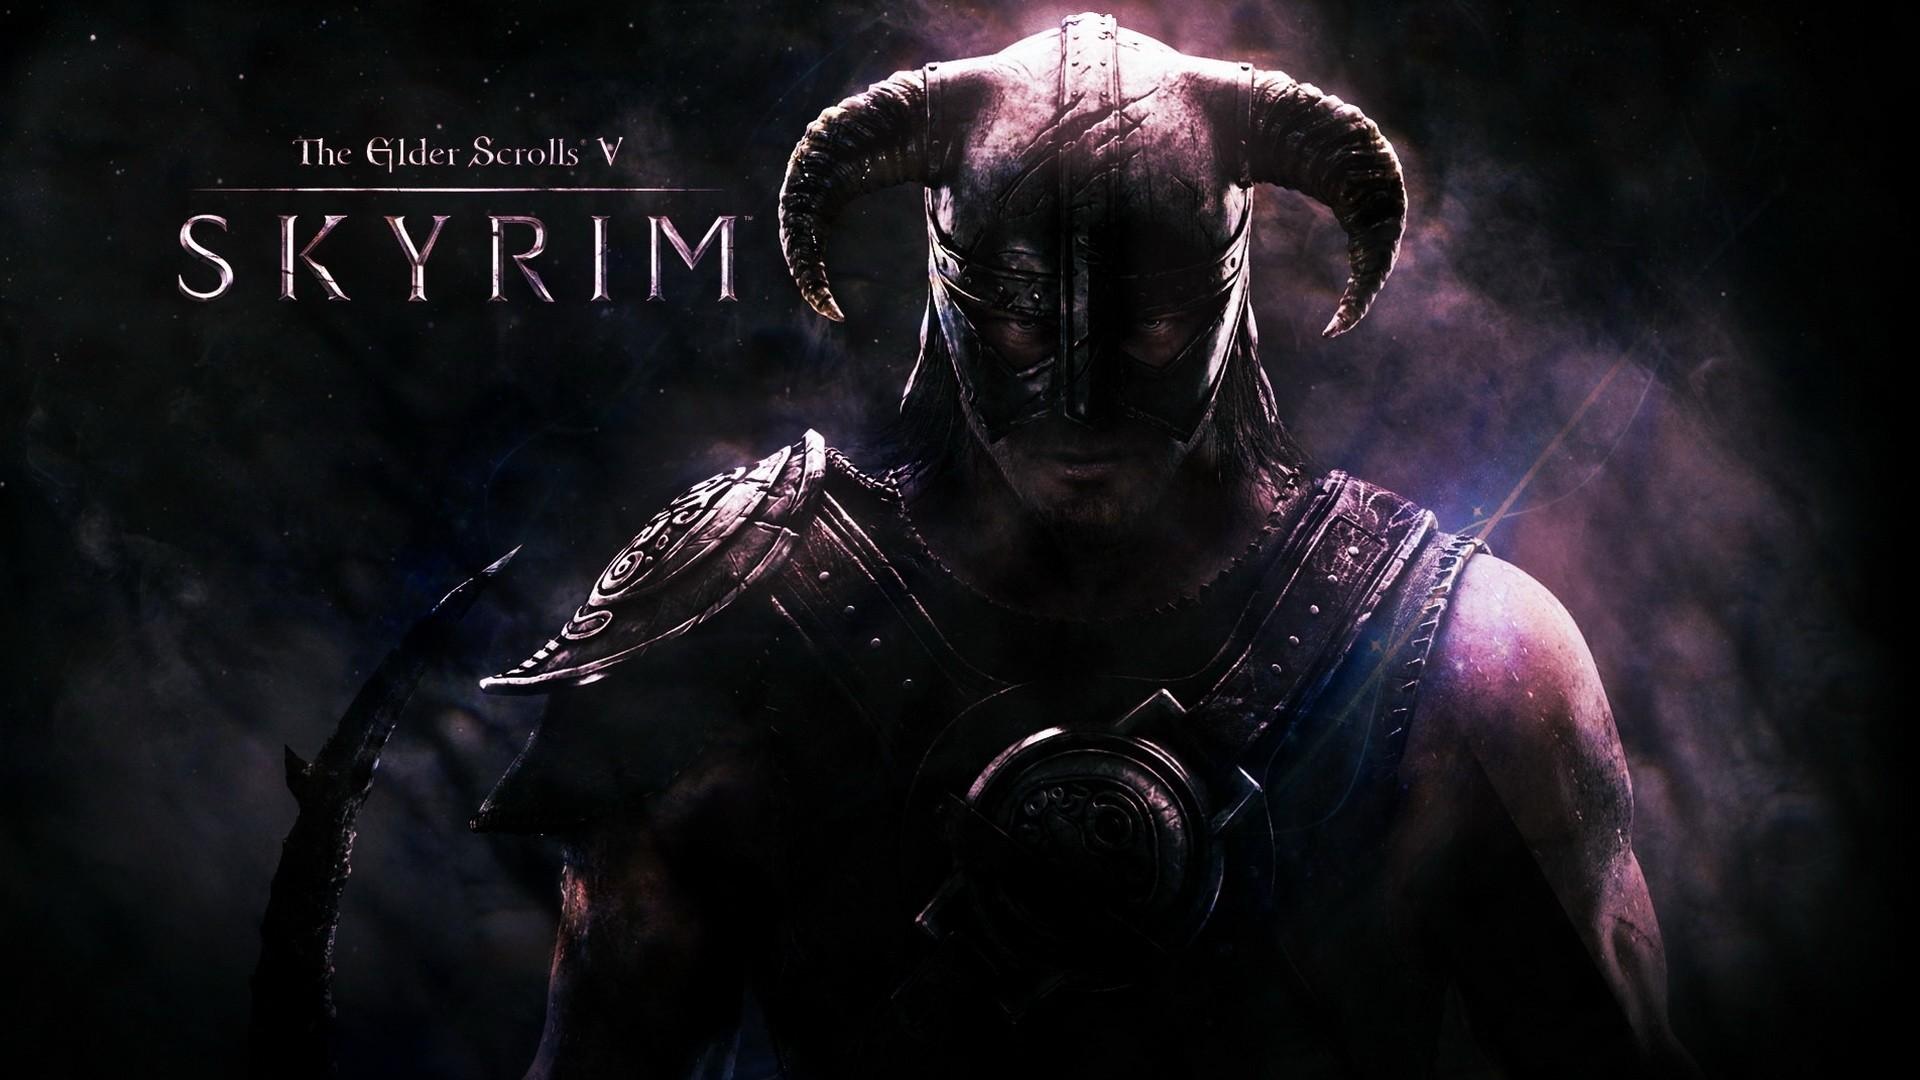 the elder scrolls skyrim, warrior, helmet